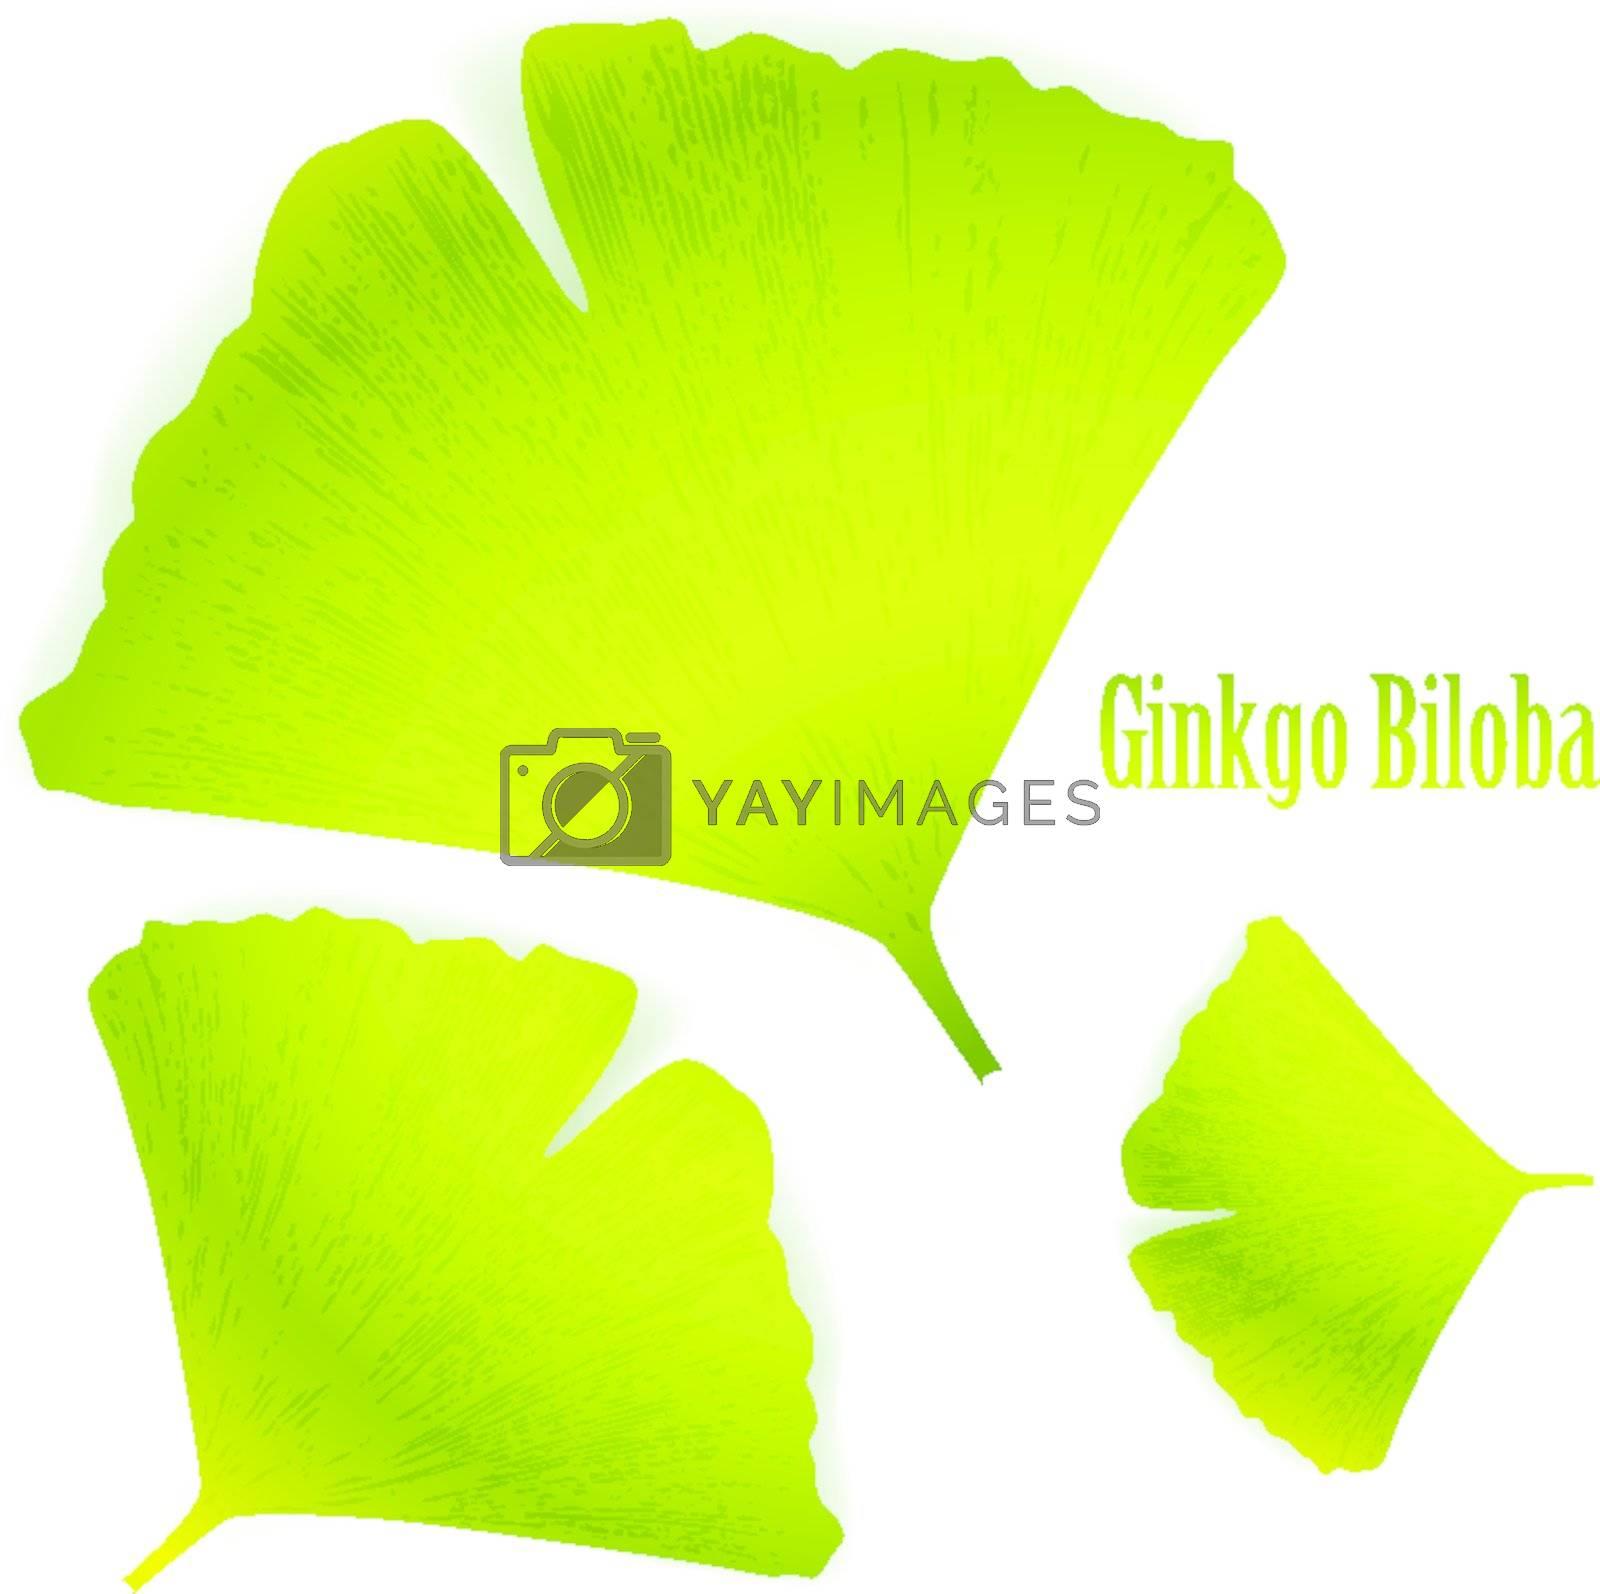 Ginkgo Biloba leaves over white